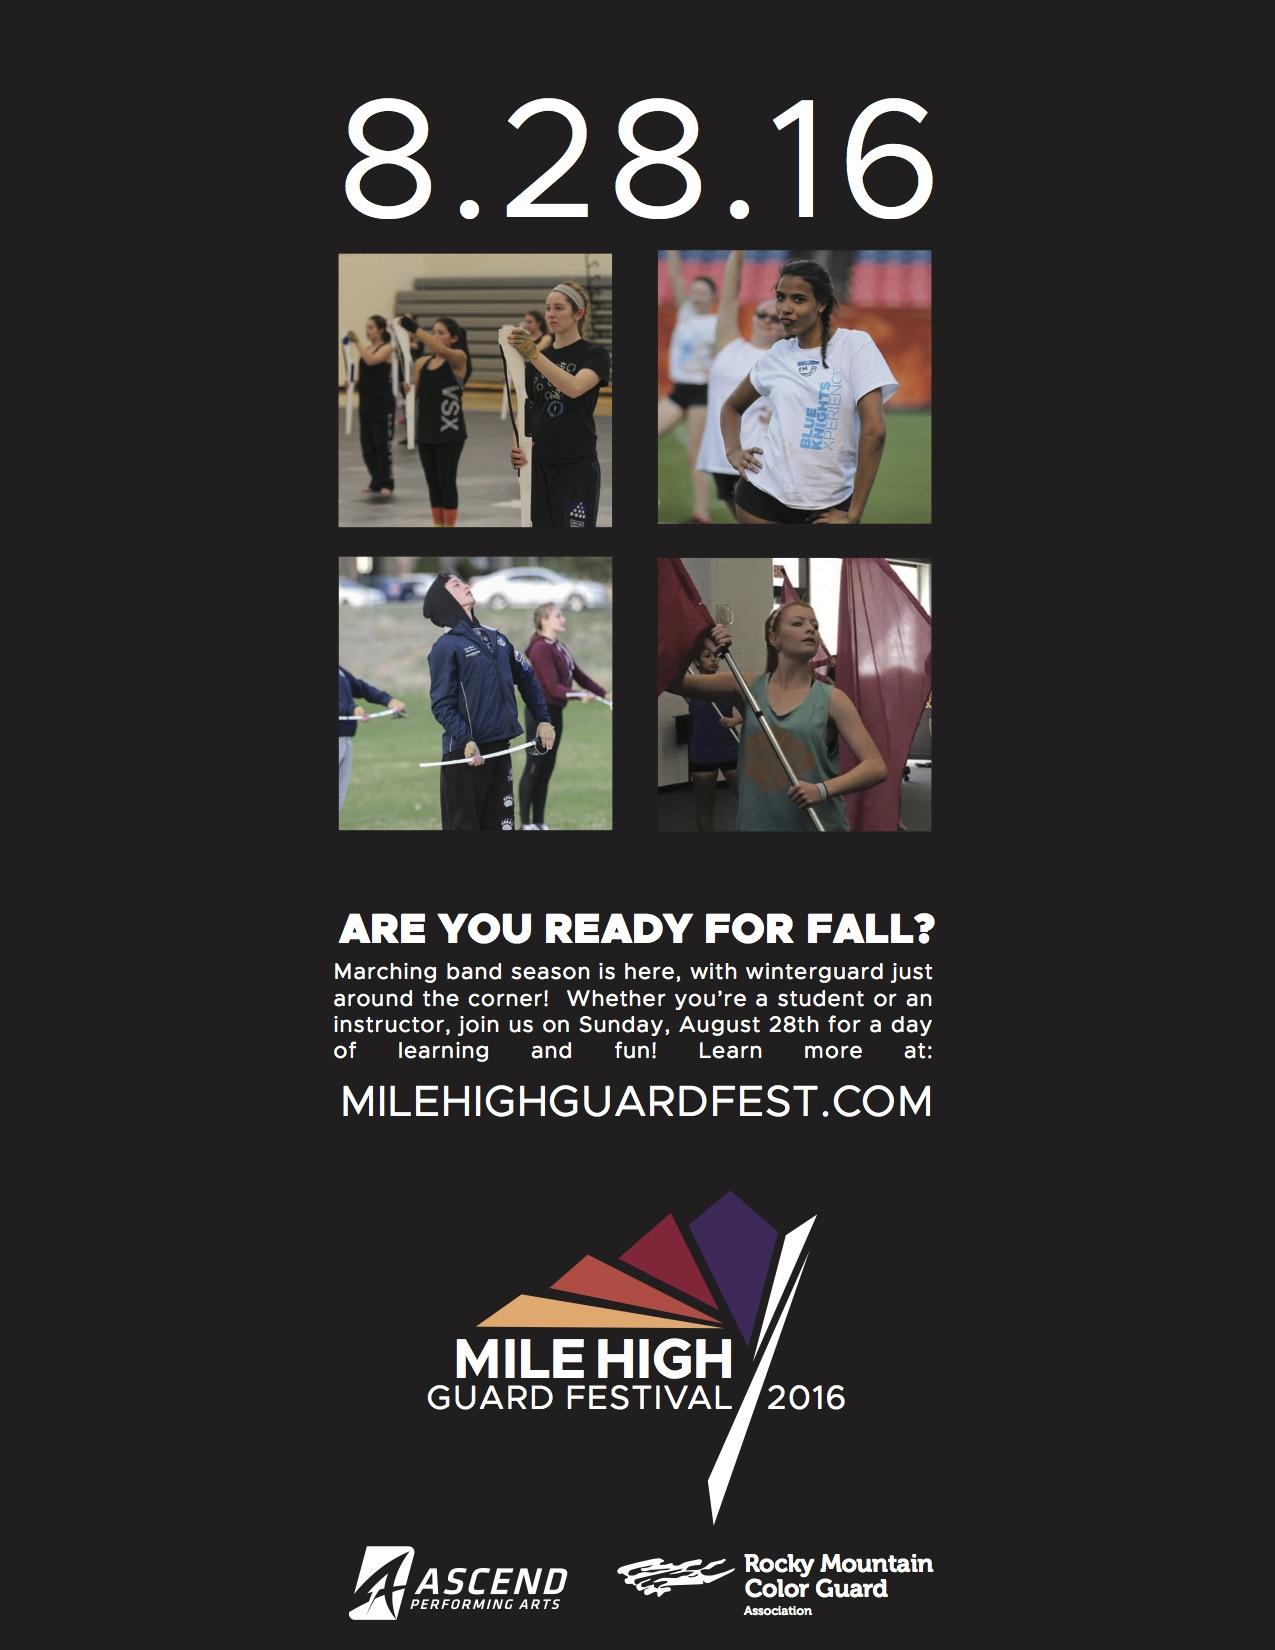 MHGF poster